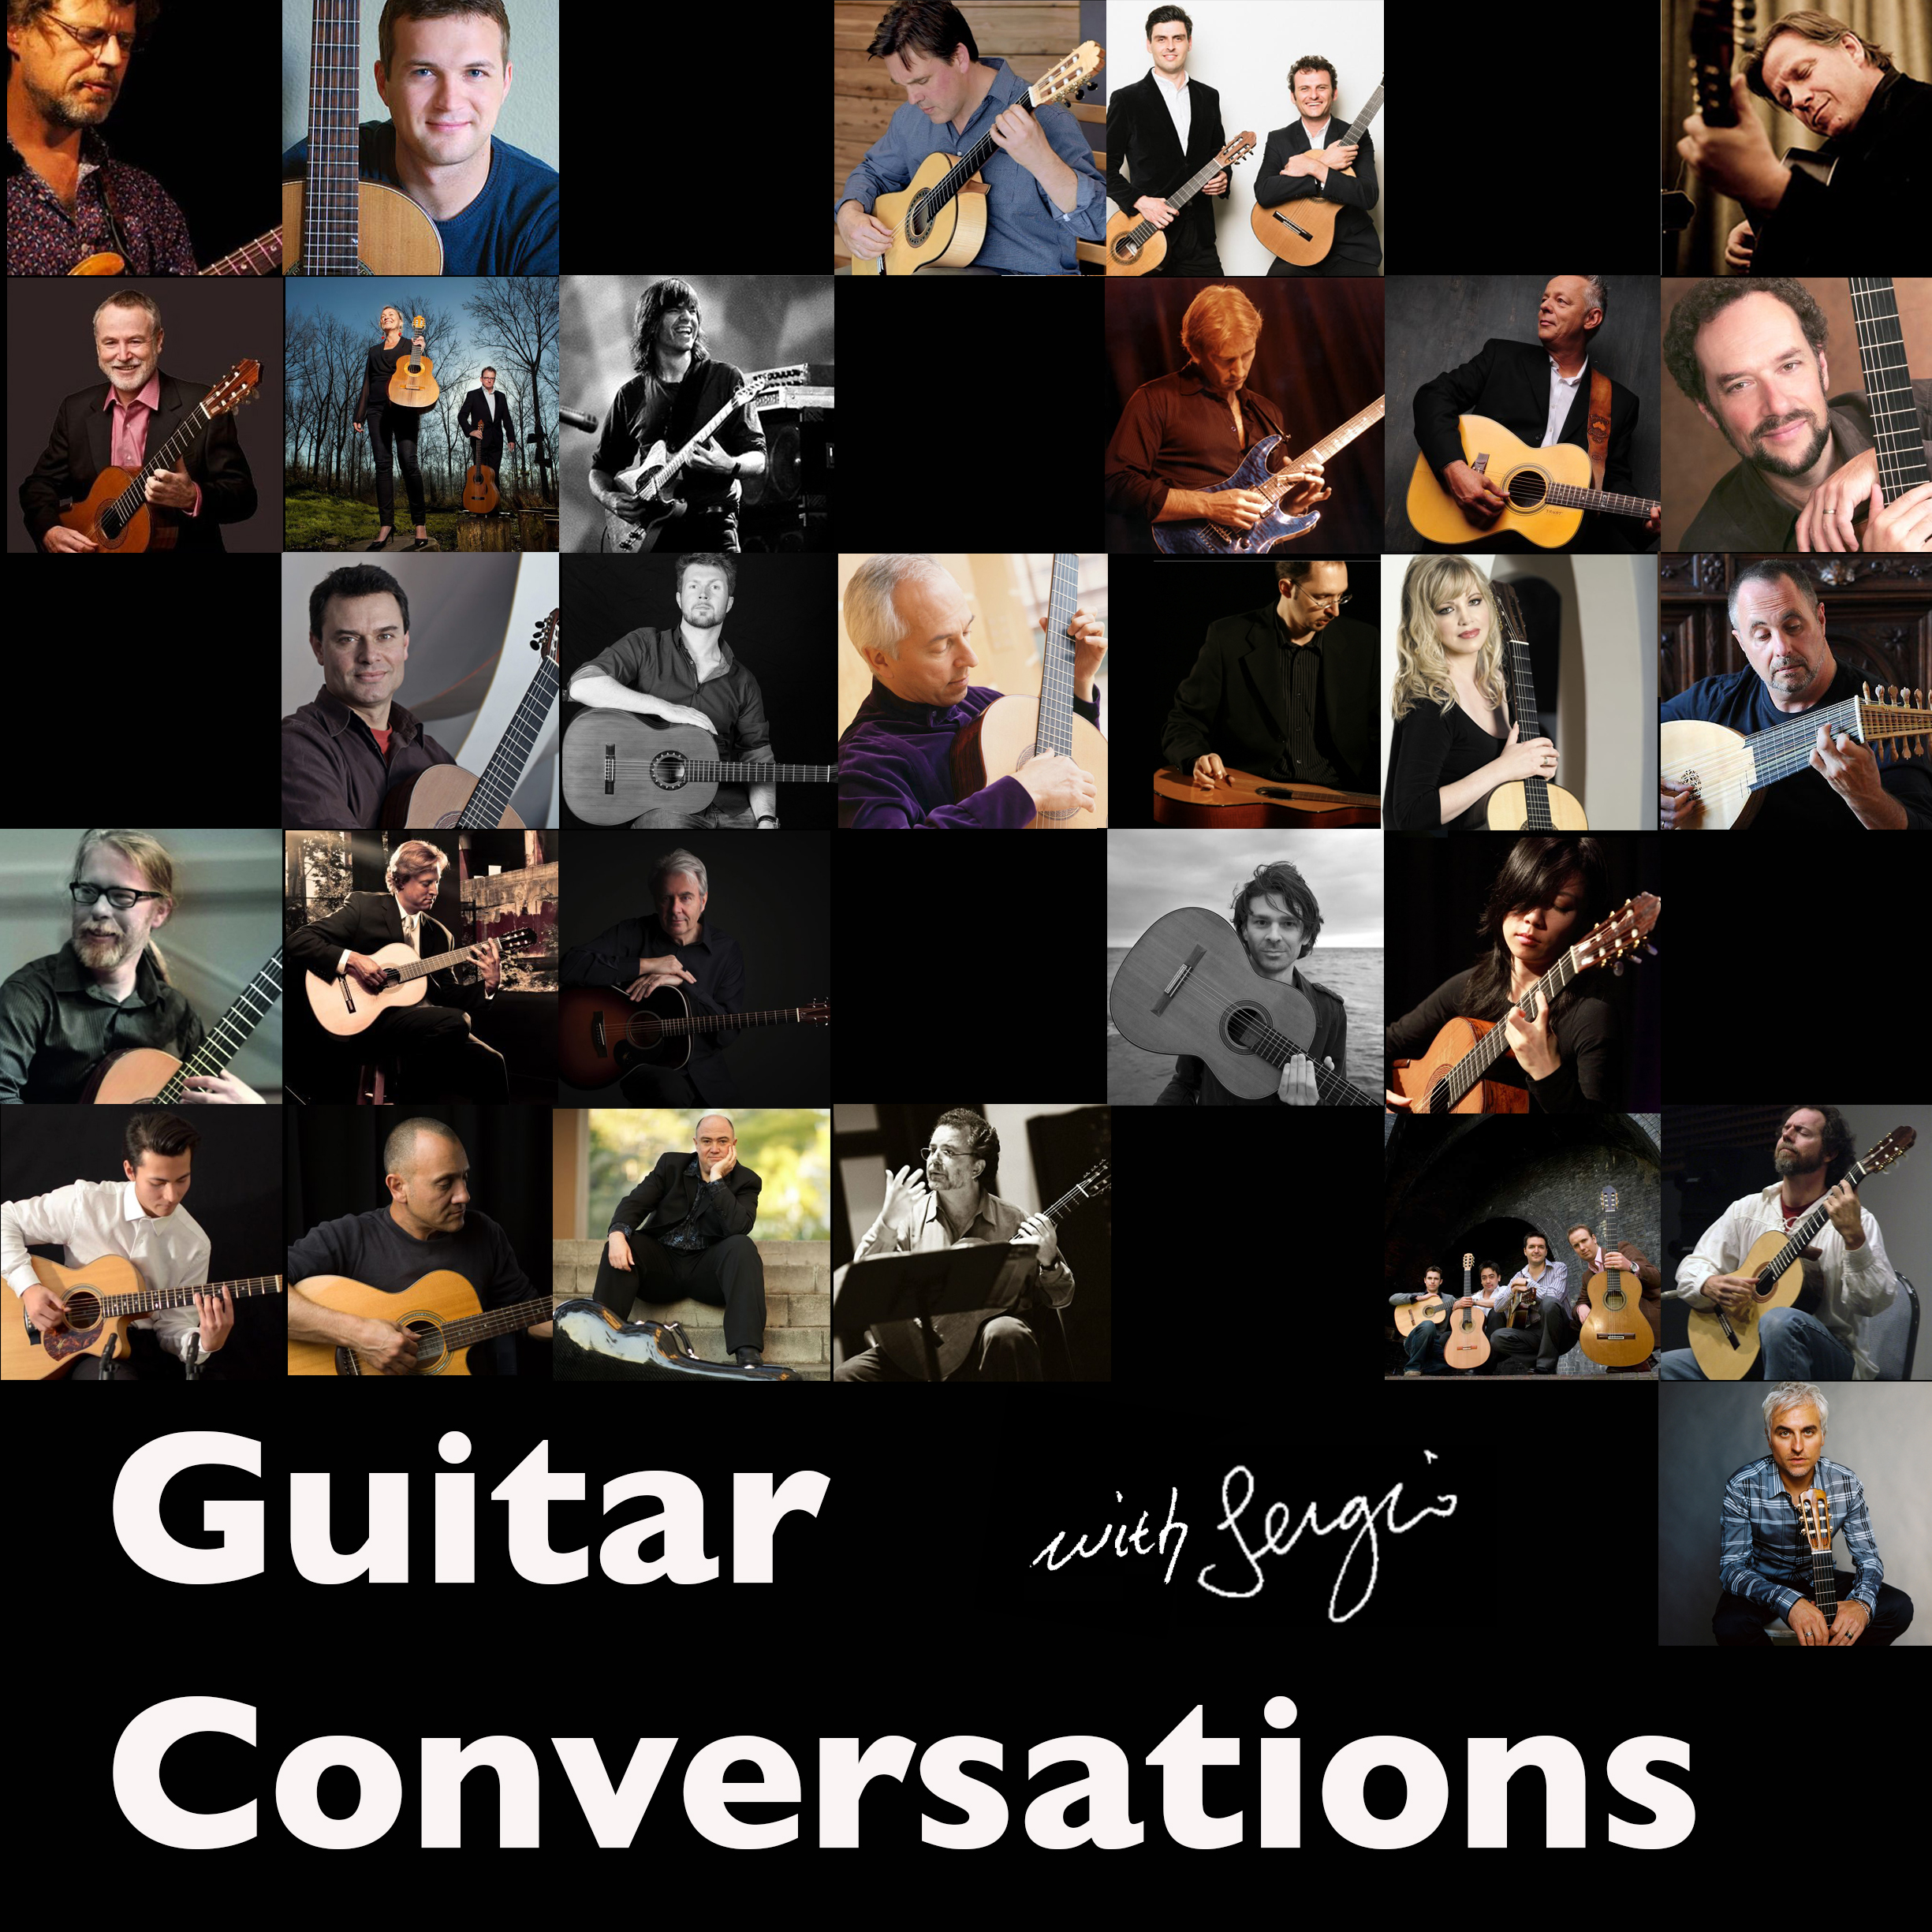 Guitar Conversations Podcast show art